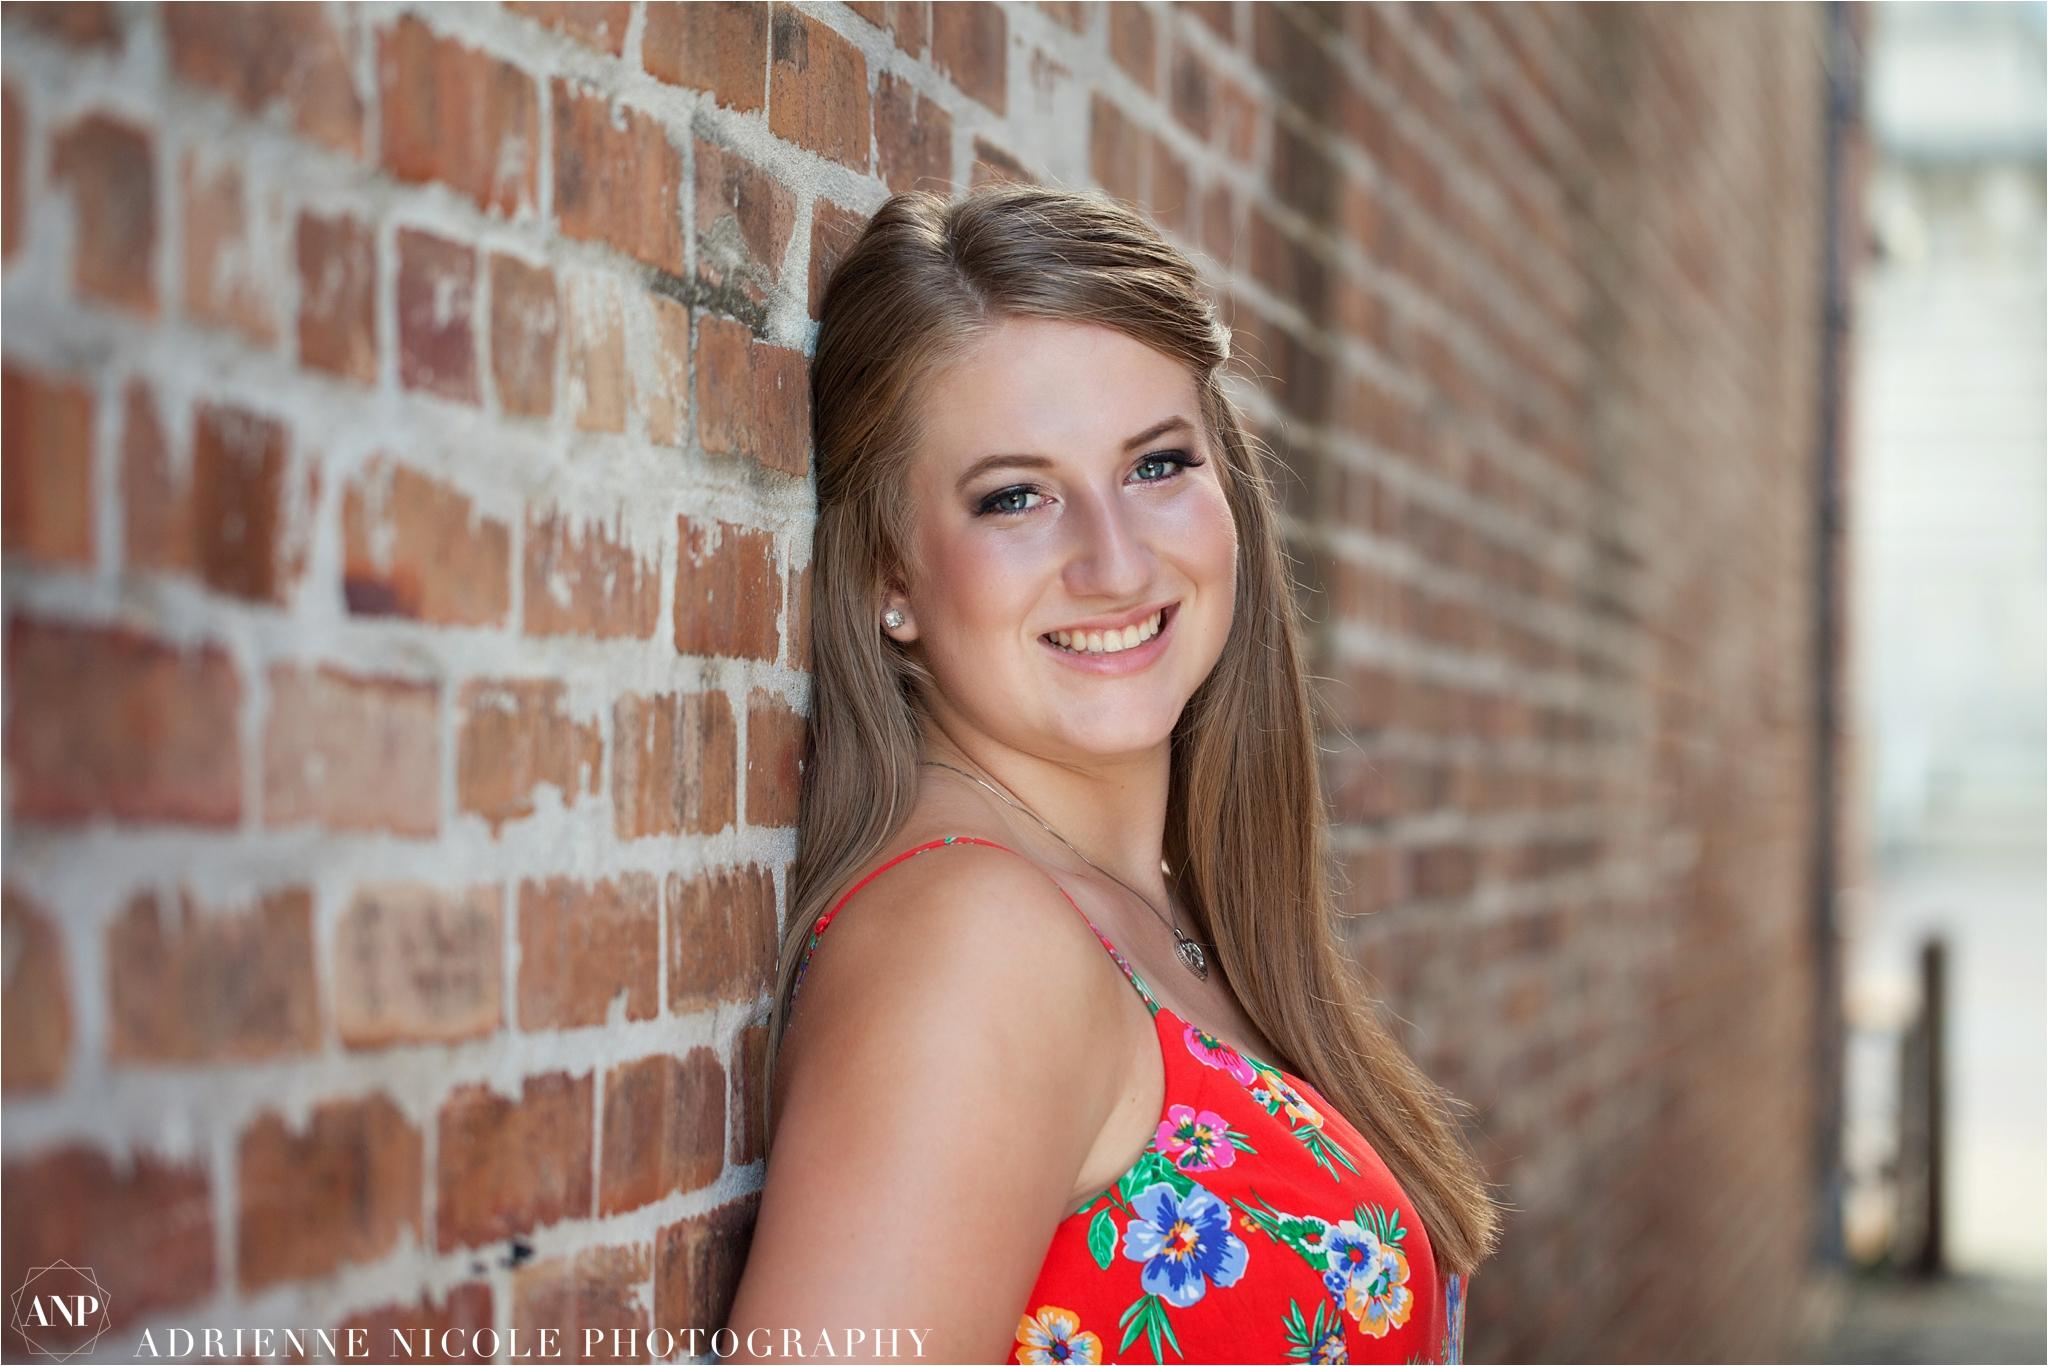 Adrienne Nicole Photography_IndianaSeniorPhotographer_Avon_1357.jpg